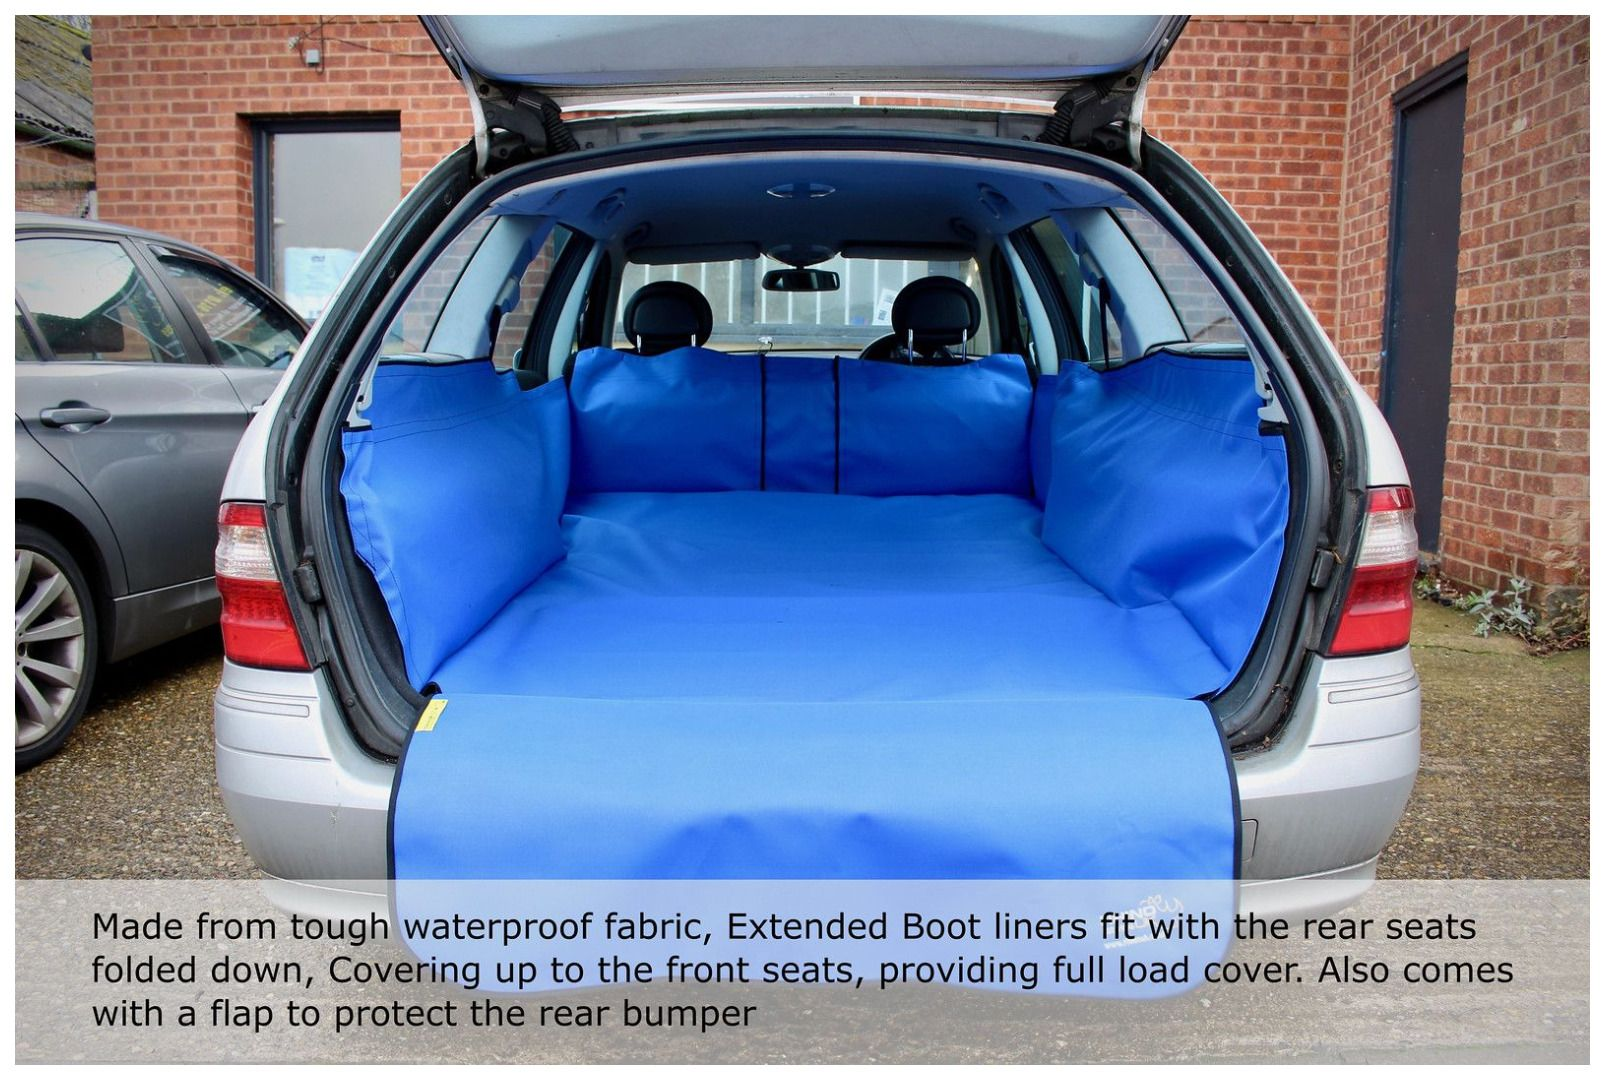 Screenshot_2020-09-16 Volvo - Up to Front Seats Boot Liner.jpg